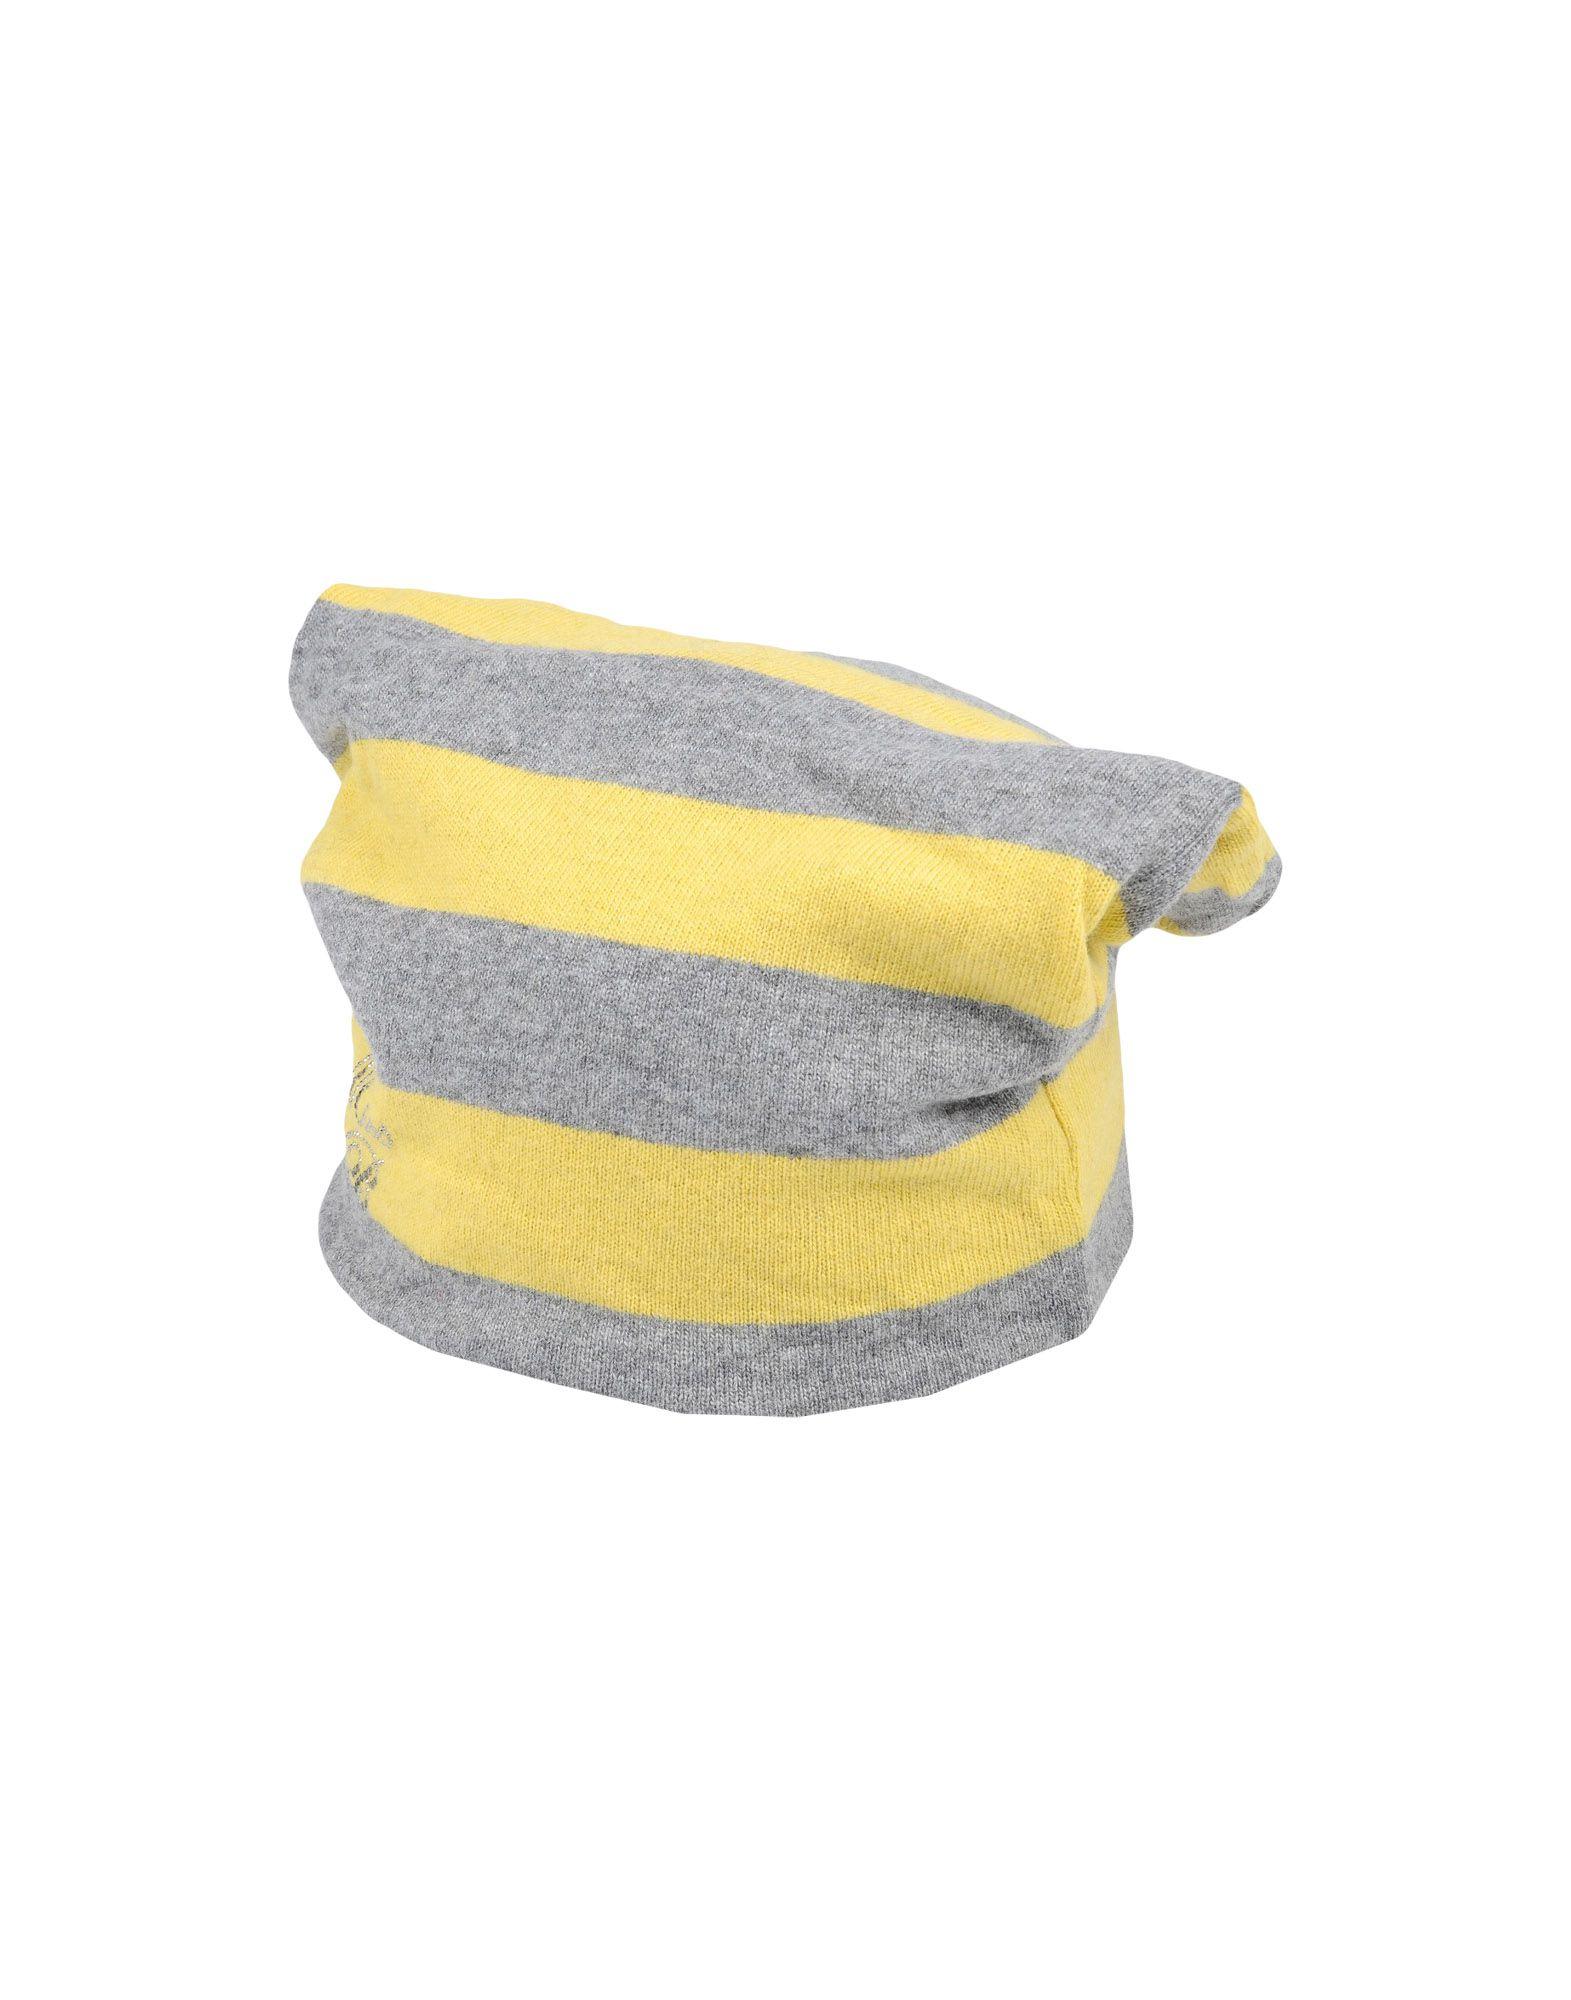 MISS BLUMARINE Головной убор miss blumarine jeans одеяло